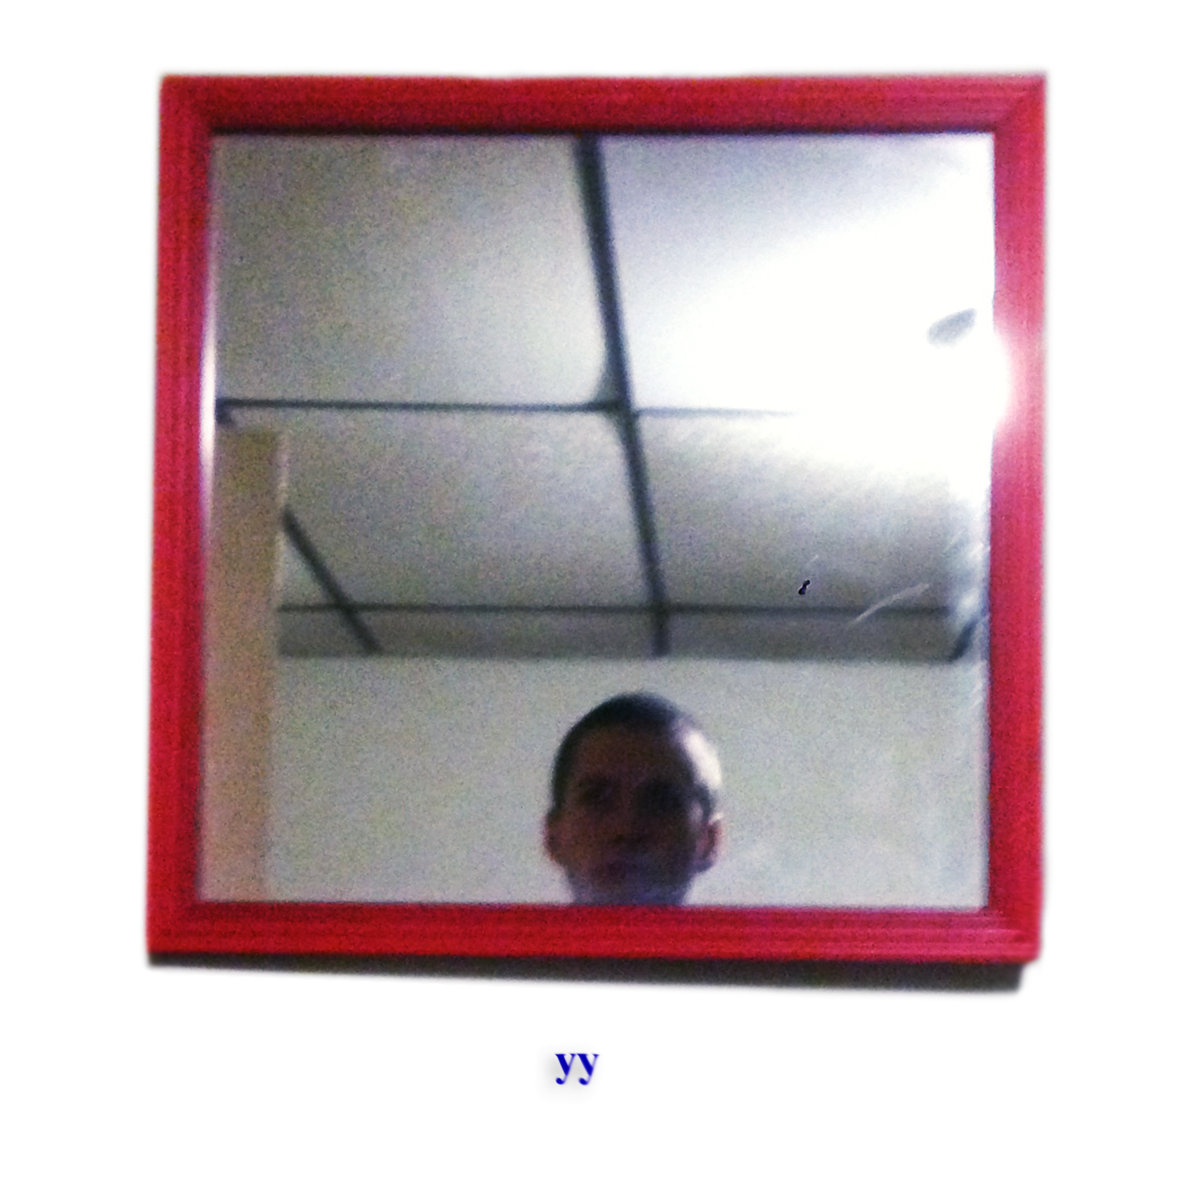 ylayali yy album cover